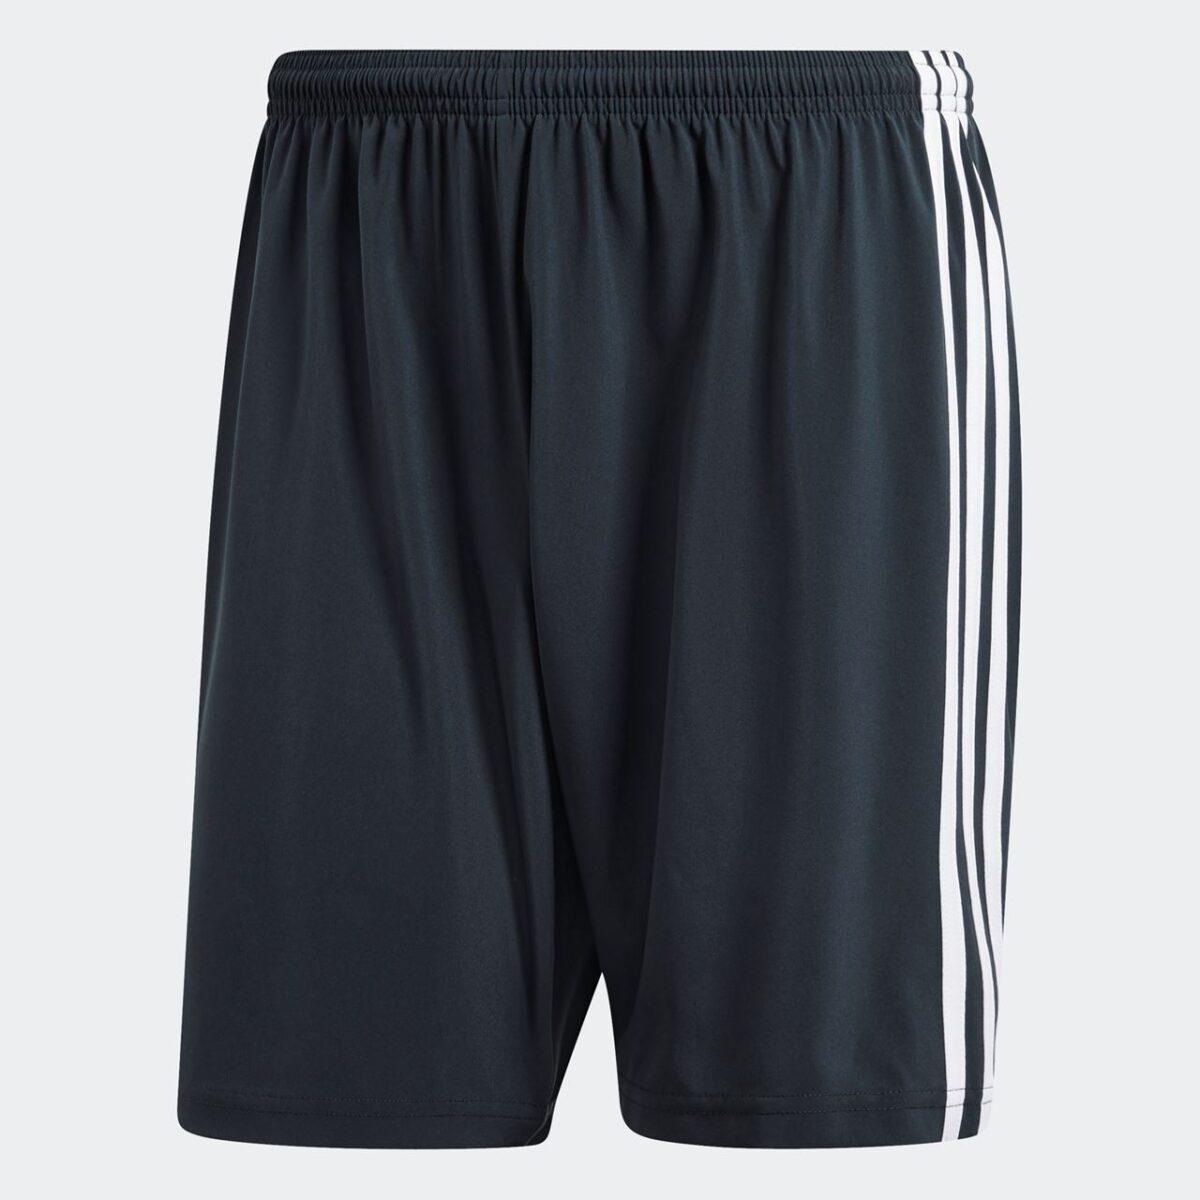 Adidas Condivo 18 GK Shorts Junior